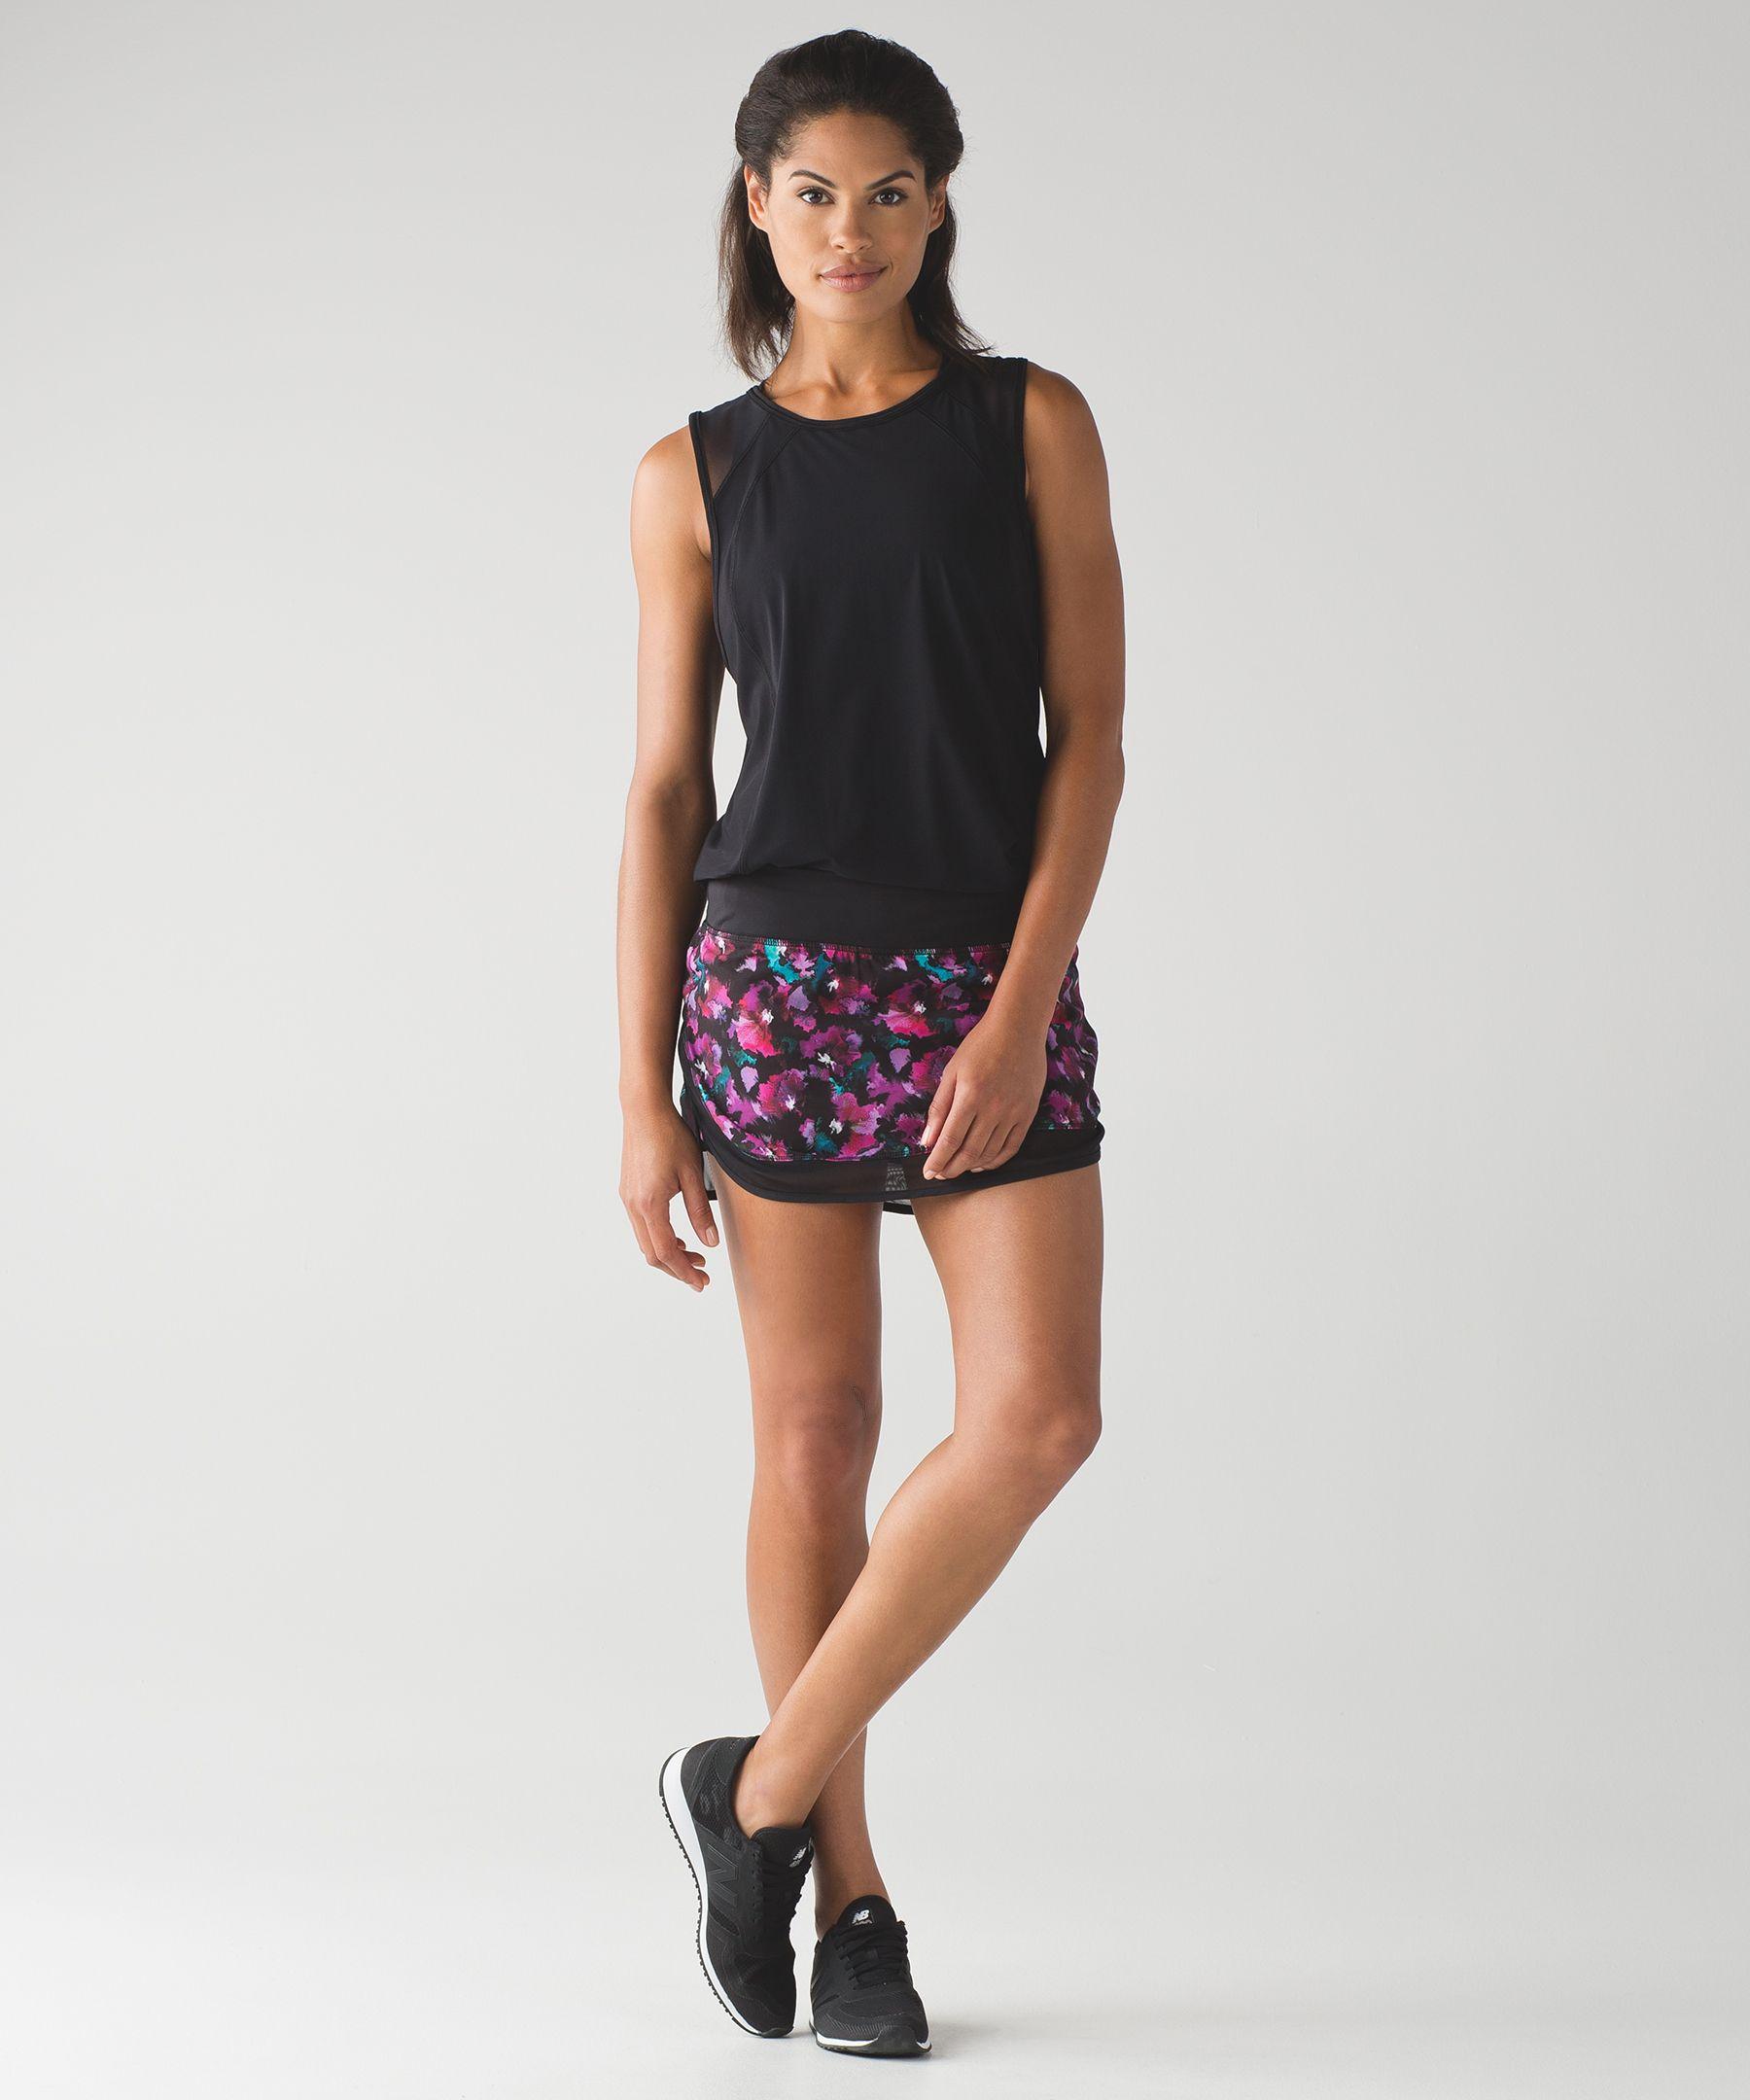 Hotty Hot Skirt II *14